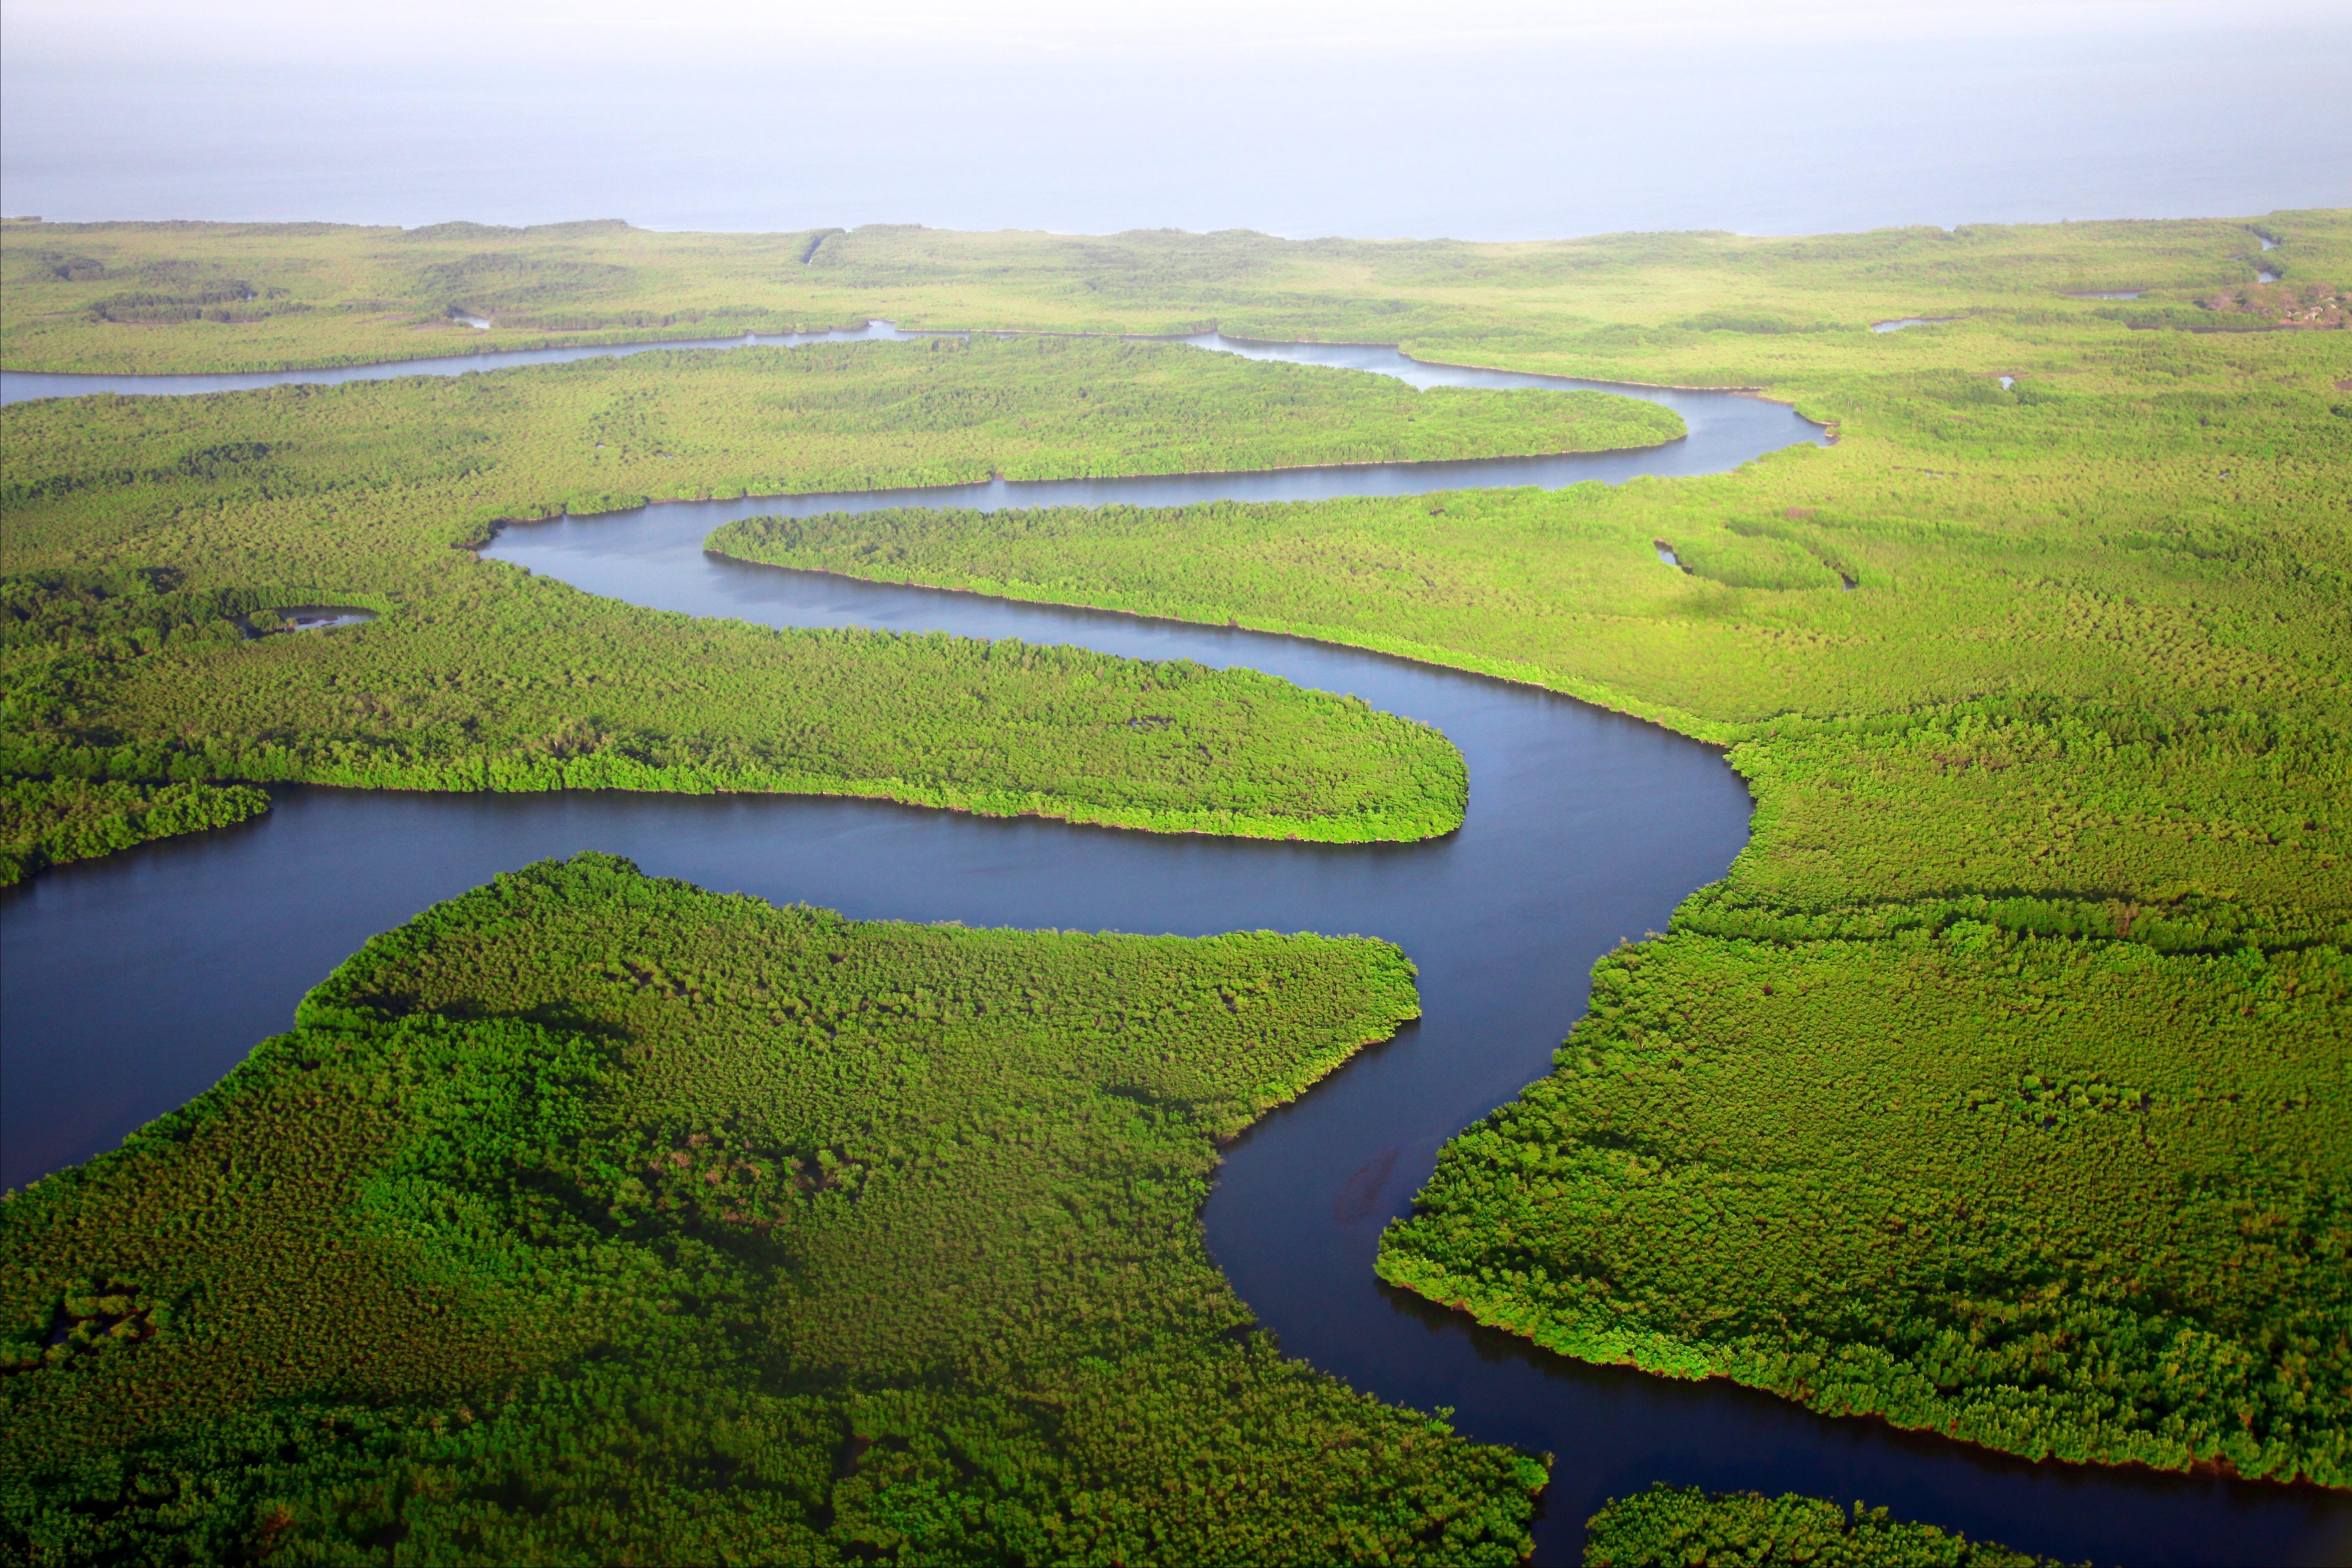 Title: Rivers Bend poem stories